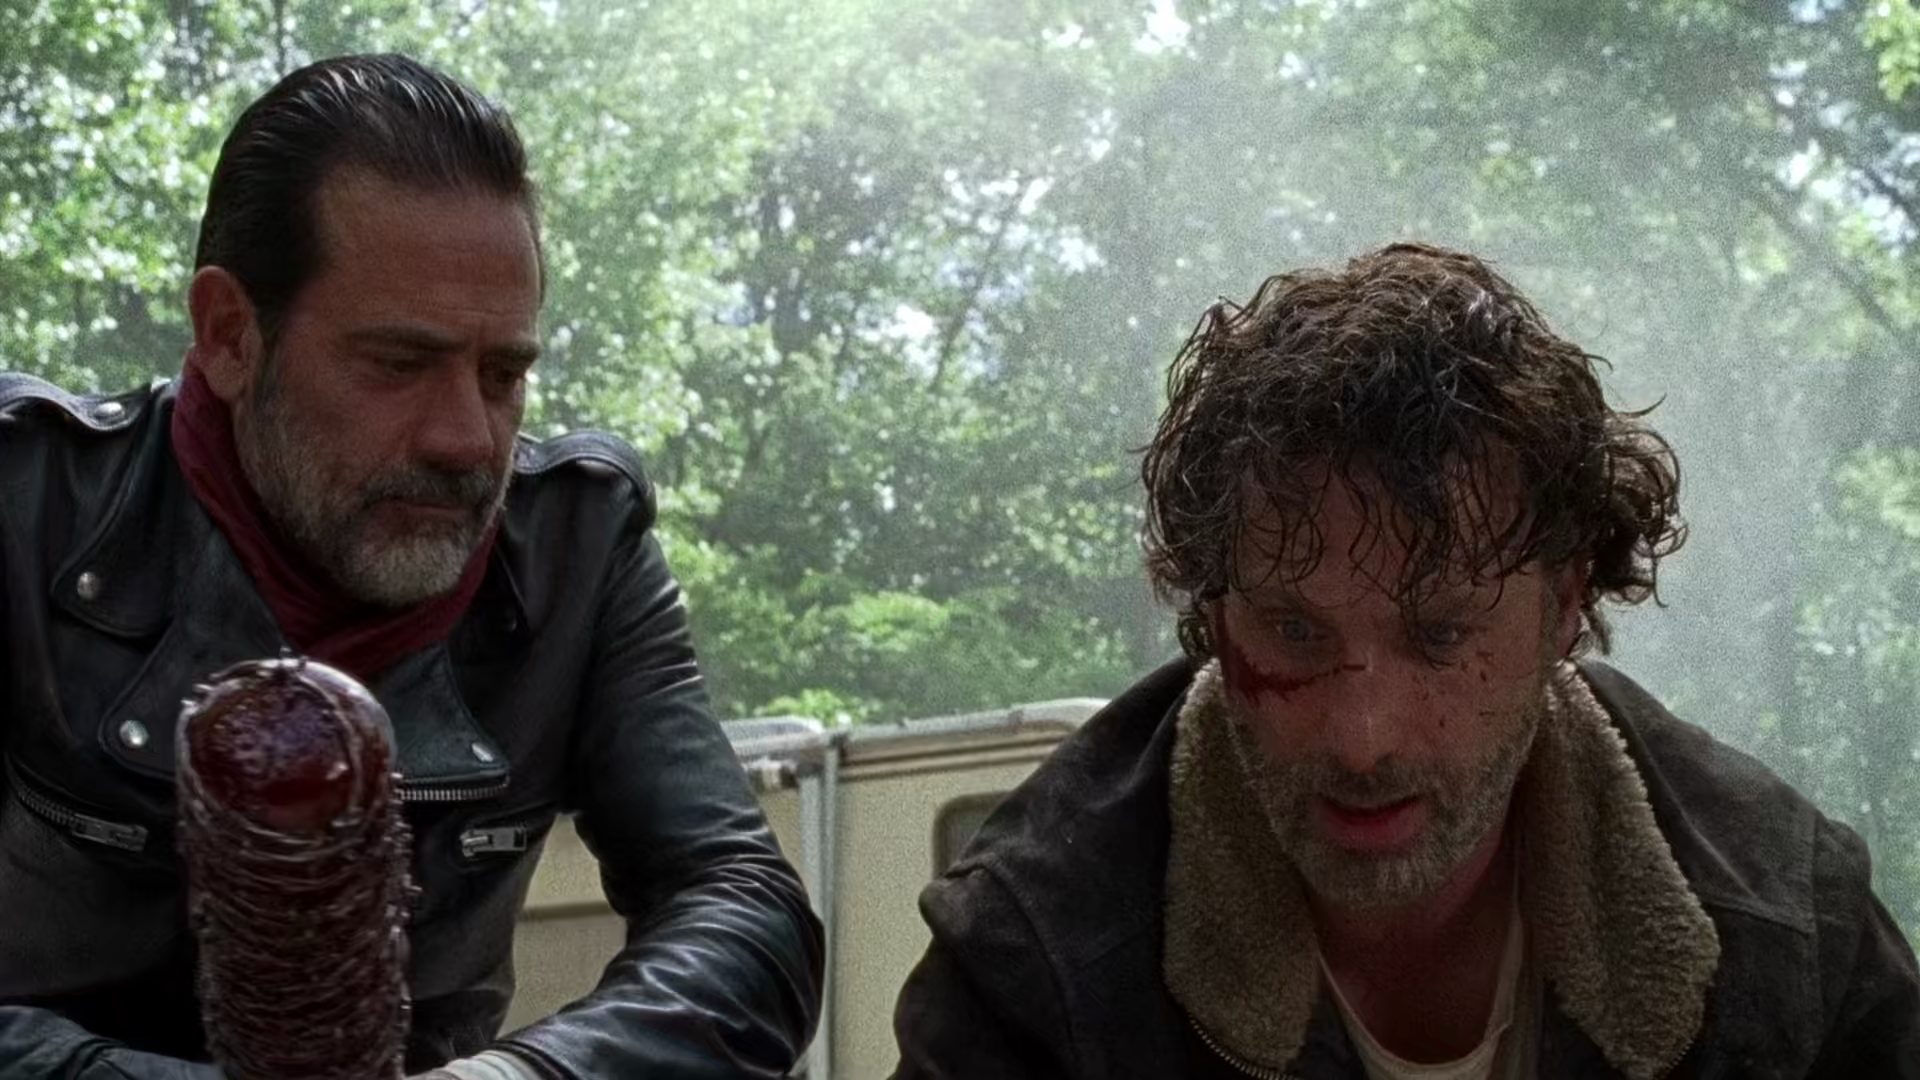 Watch The Walking Dead Season 10 - New Episodes from AMC